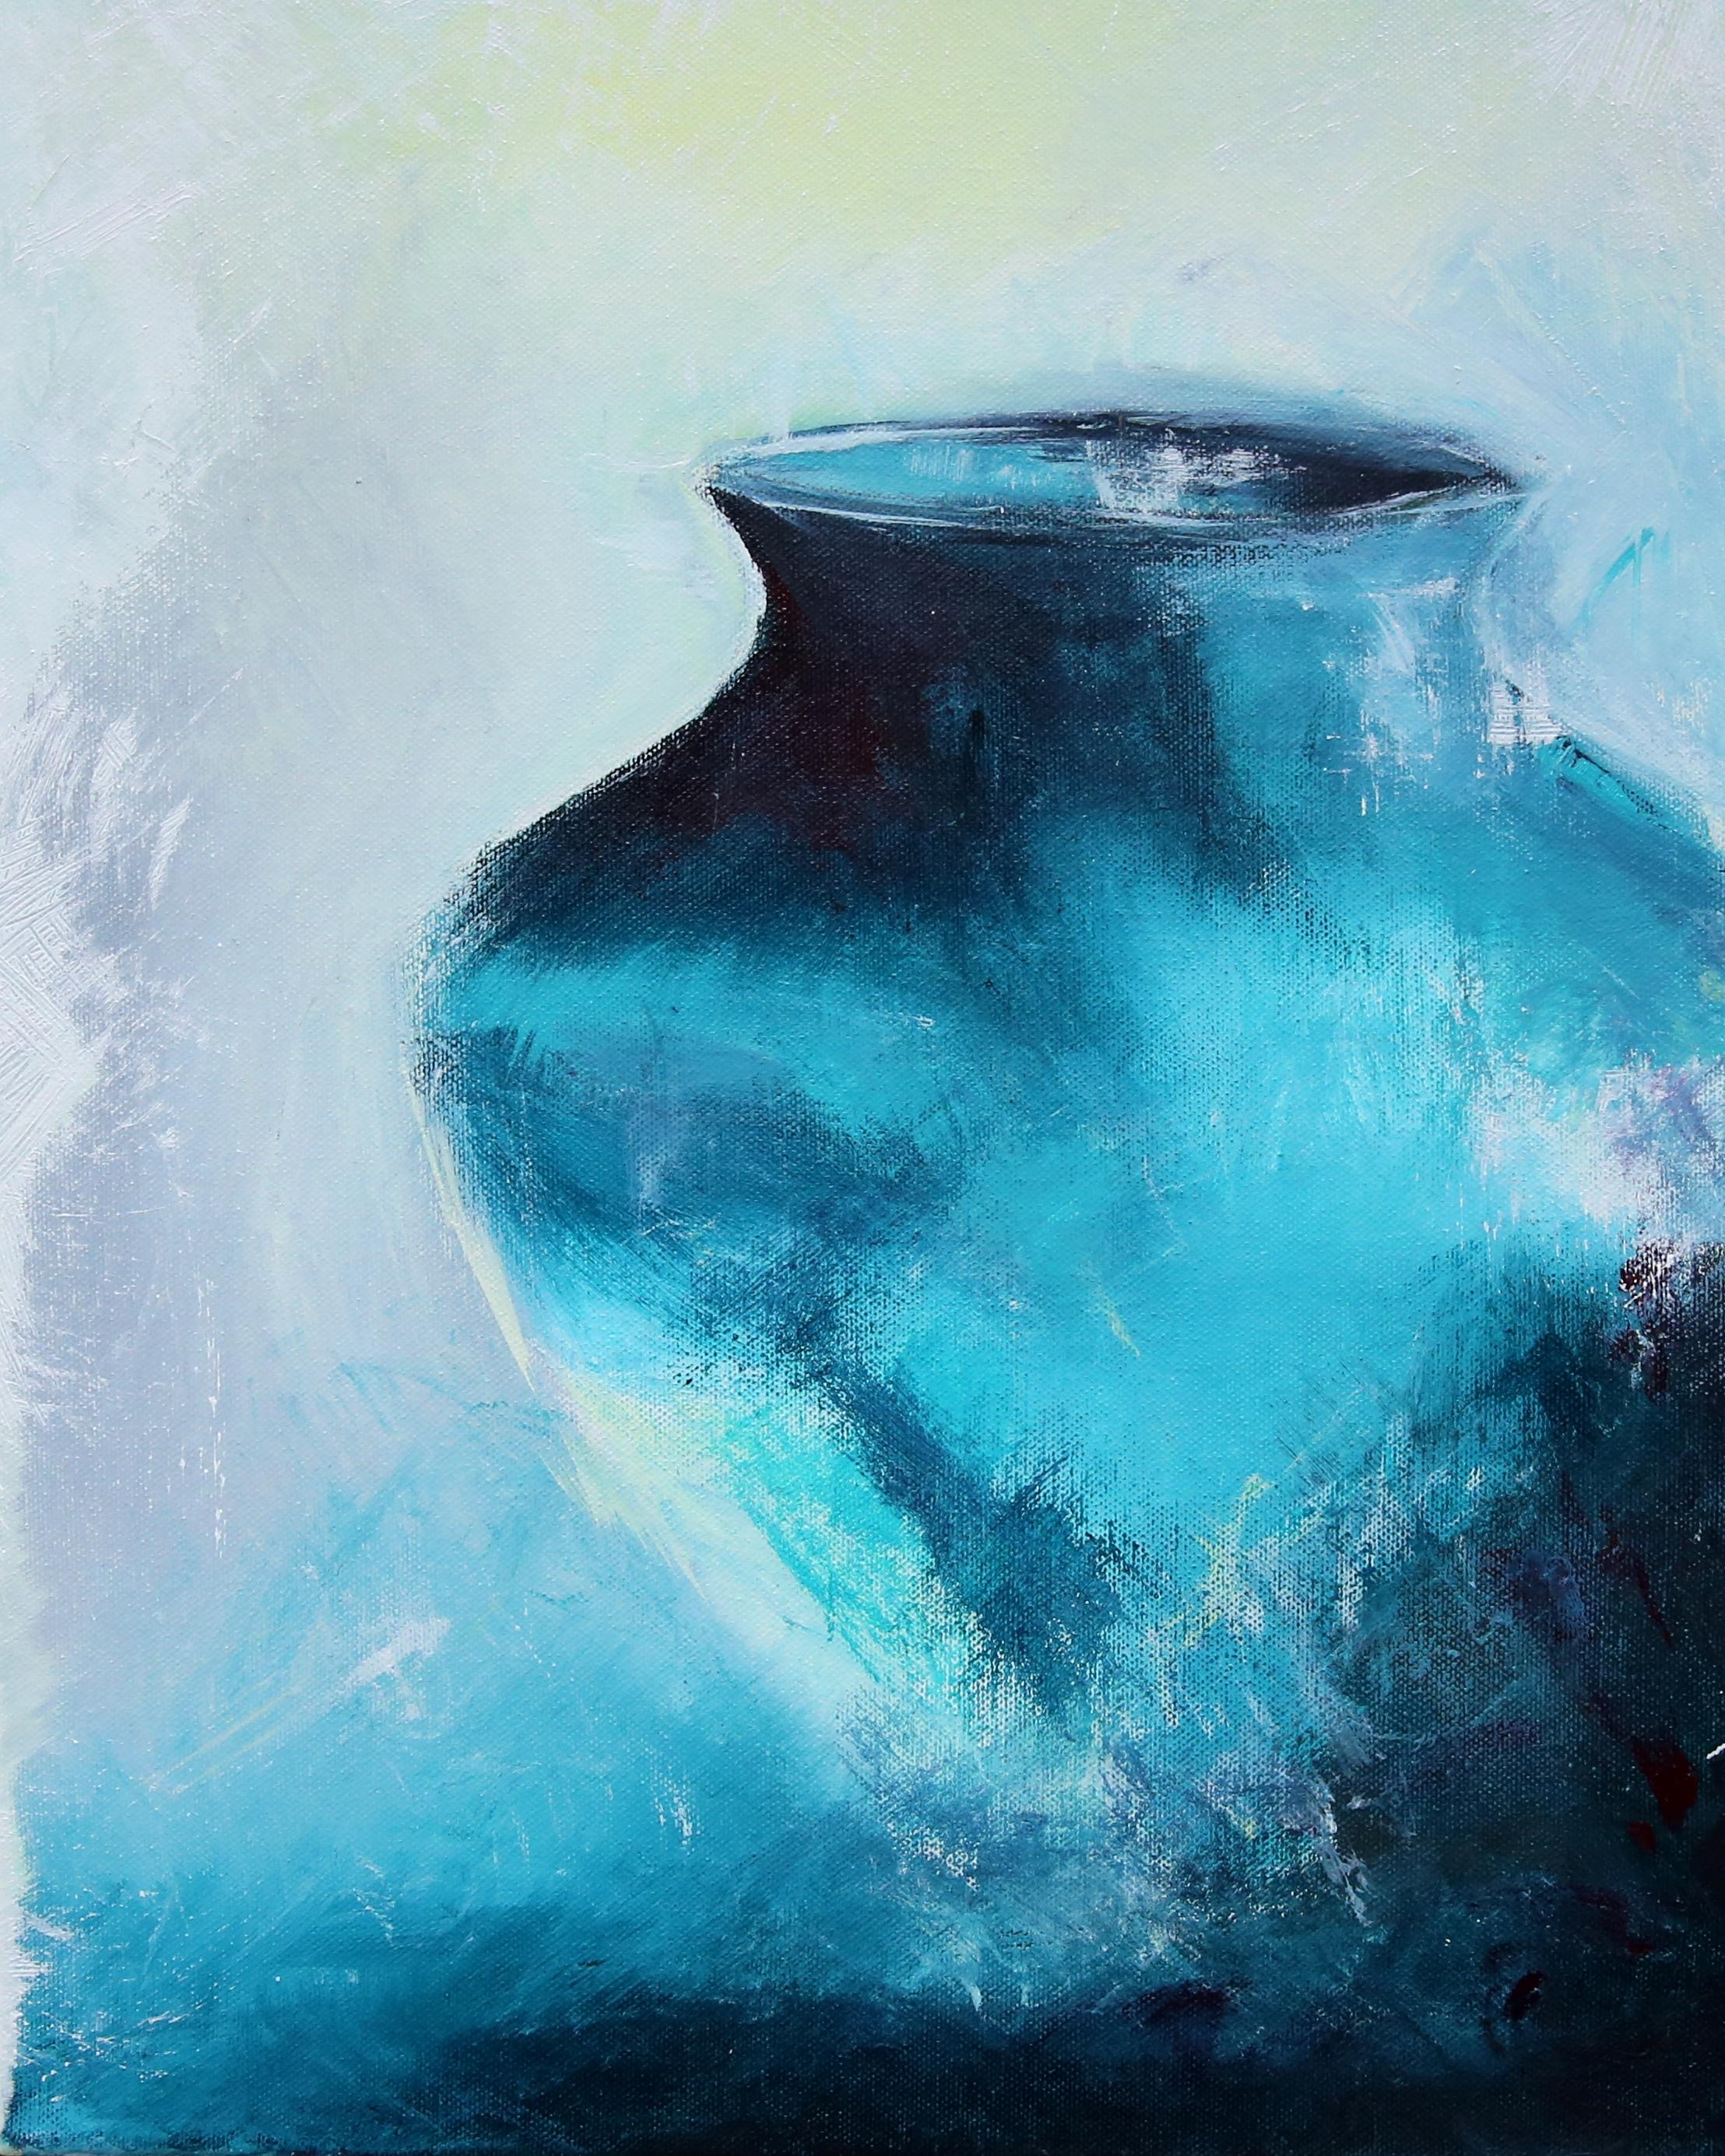 Reflexion turquoise